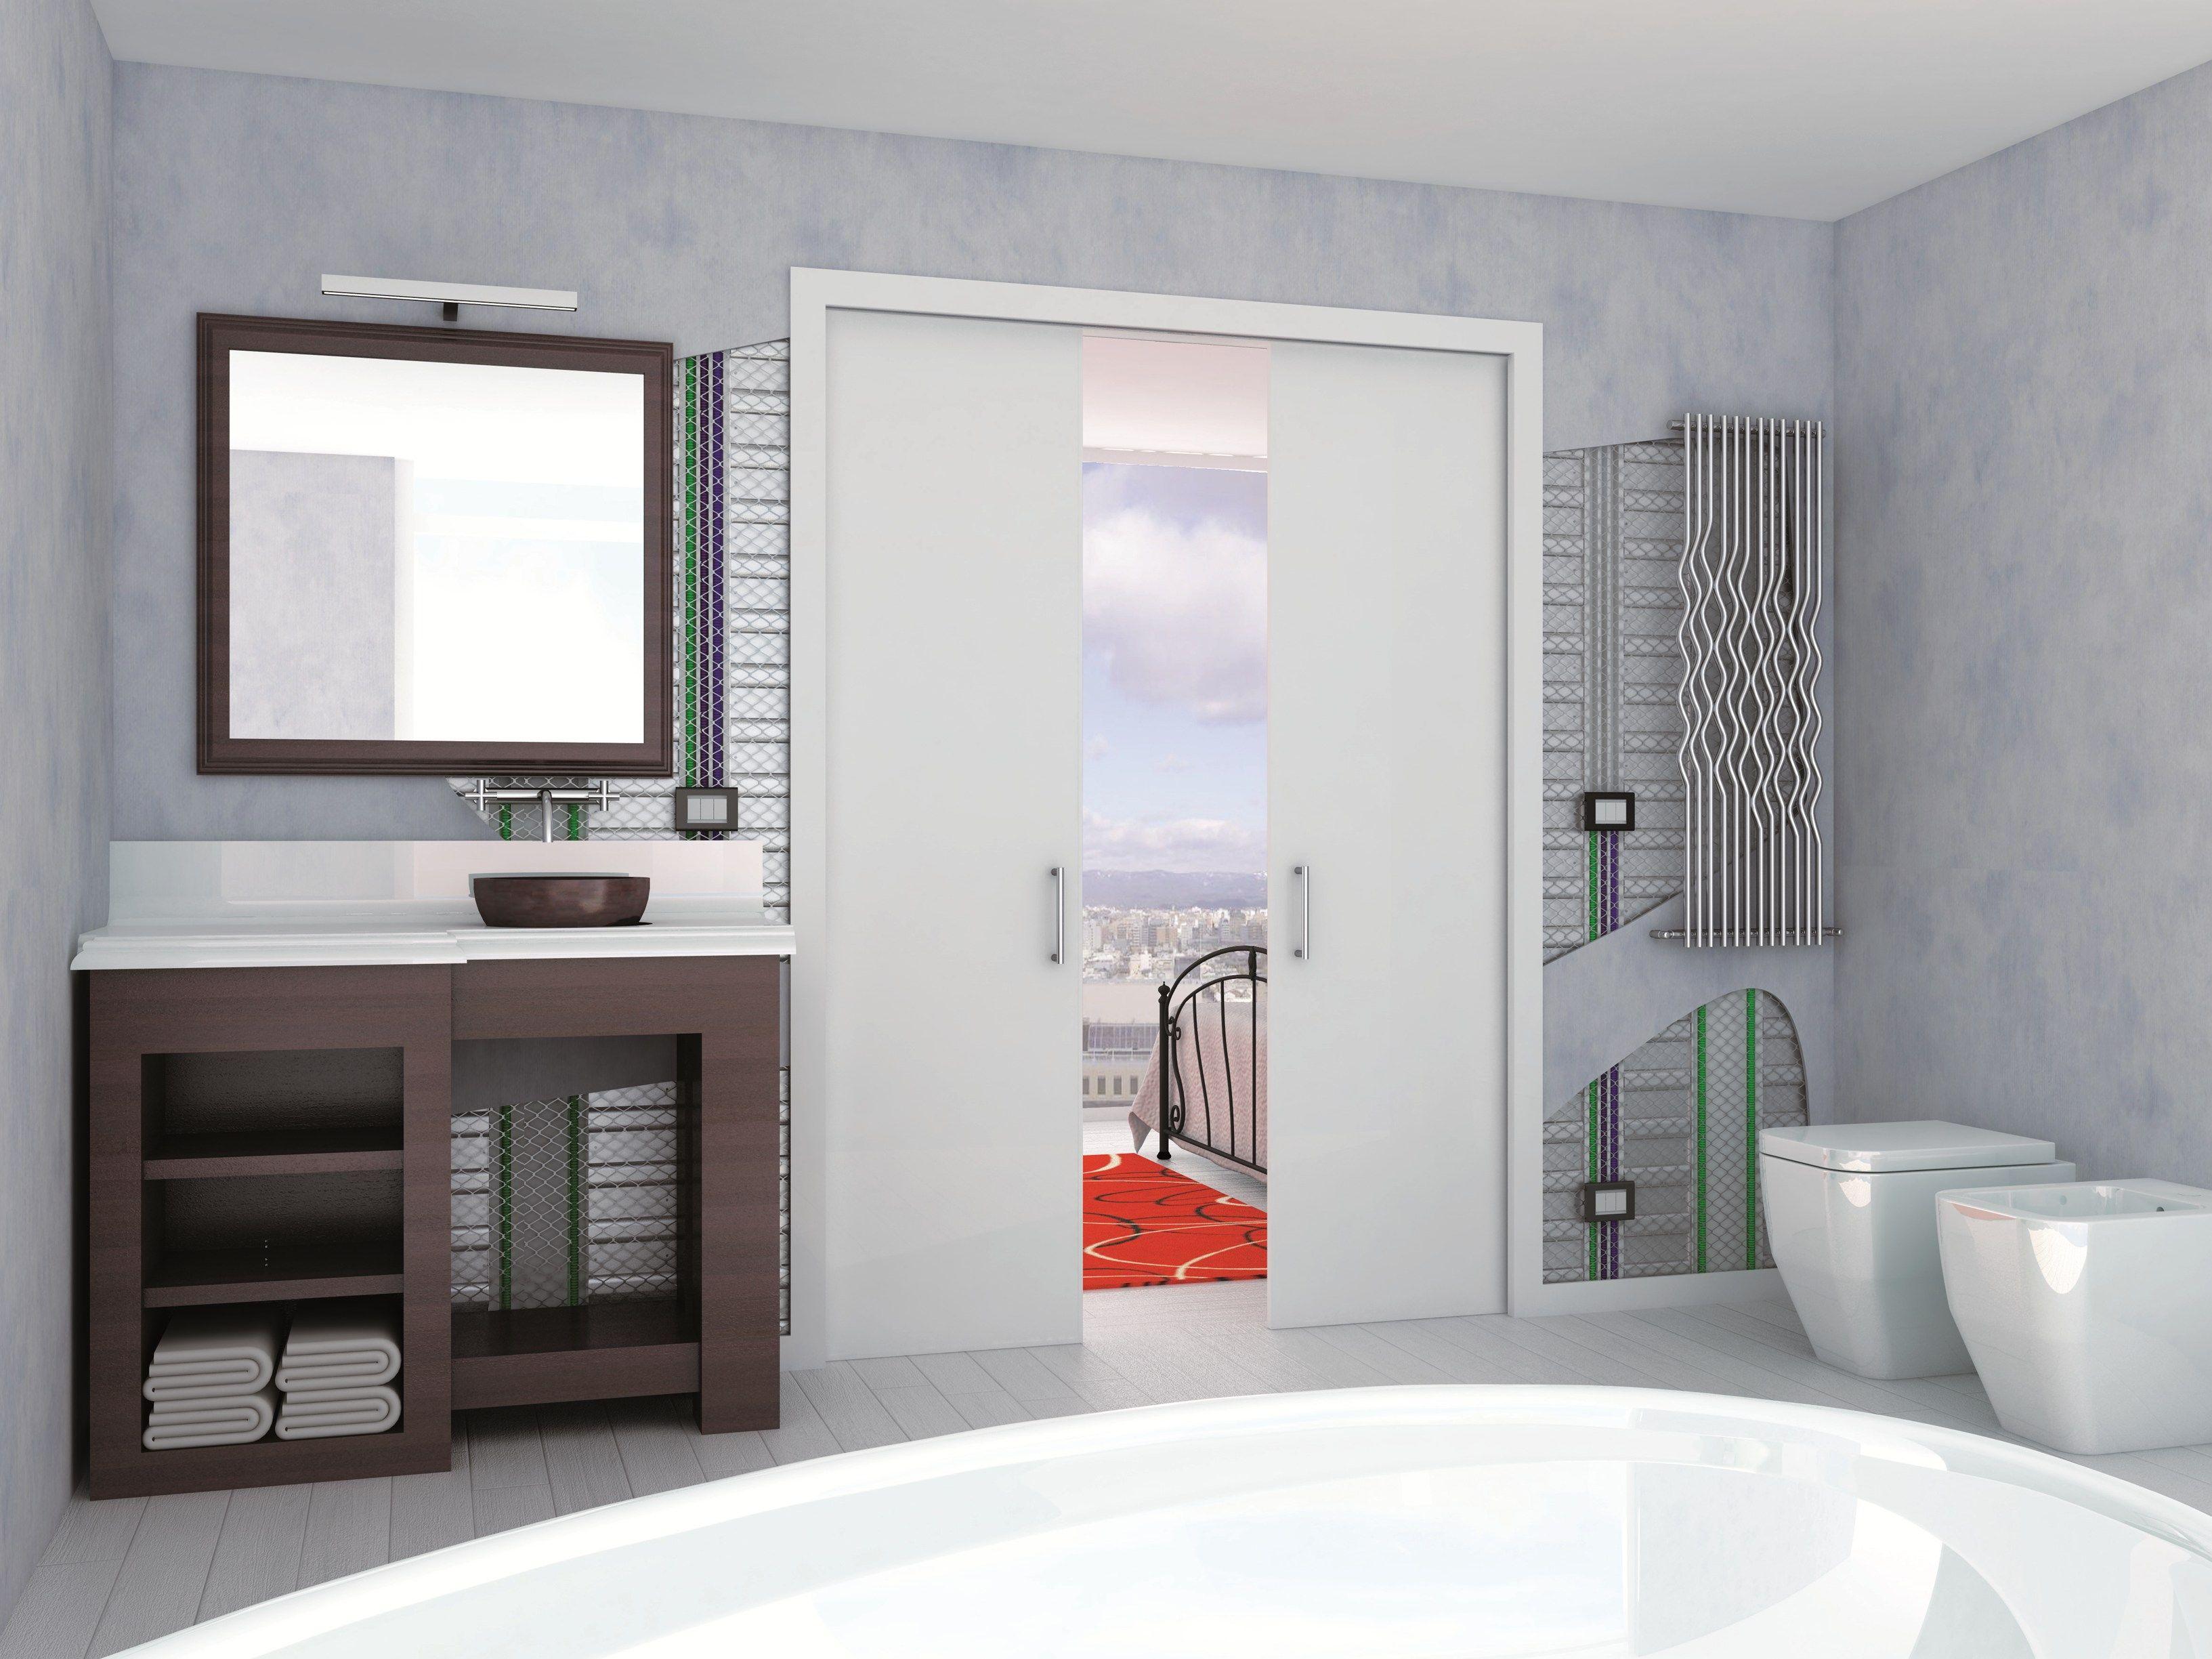 schiebet r system f r doppel schiebet ren magic box domotika doppelt by protek. Black Bedroom Furniture Sets. Home Design Ideas